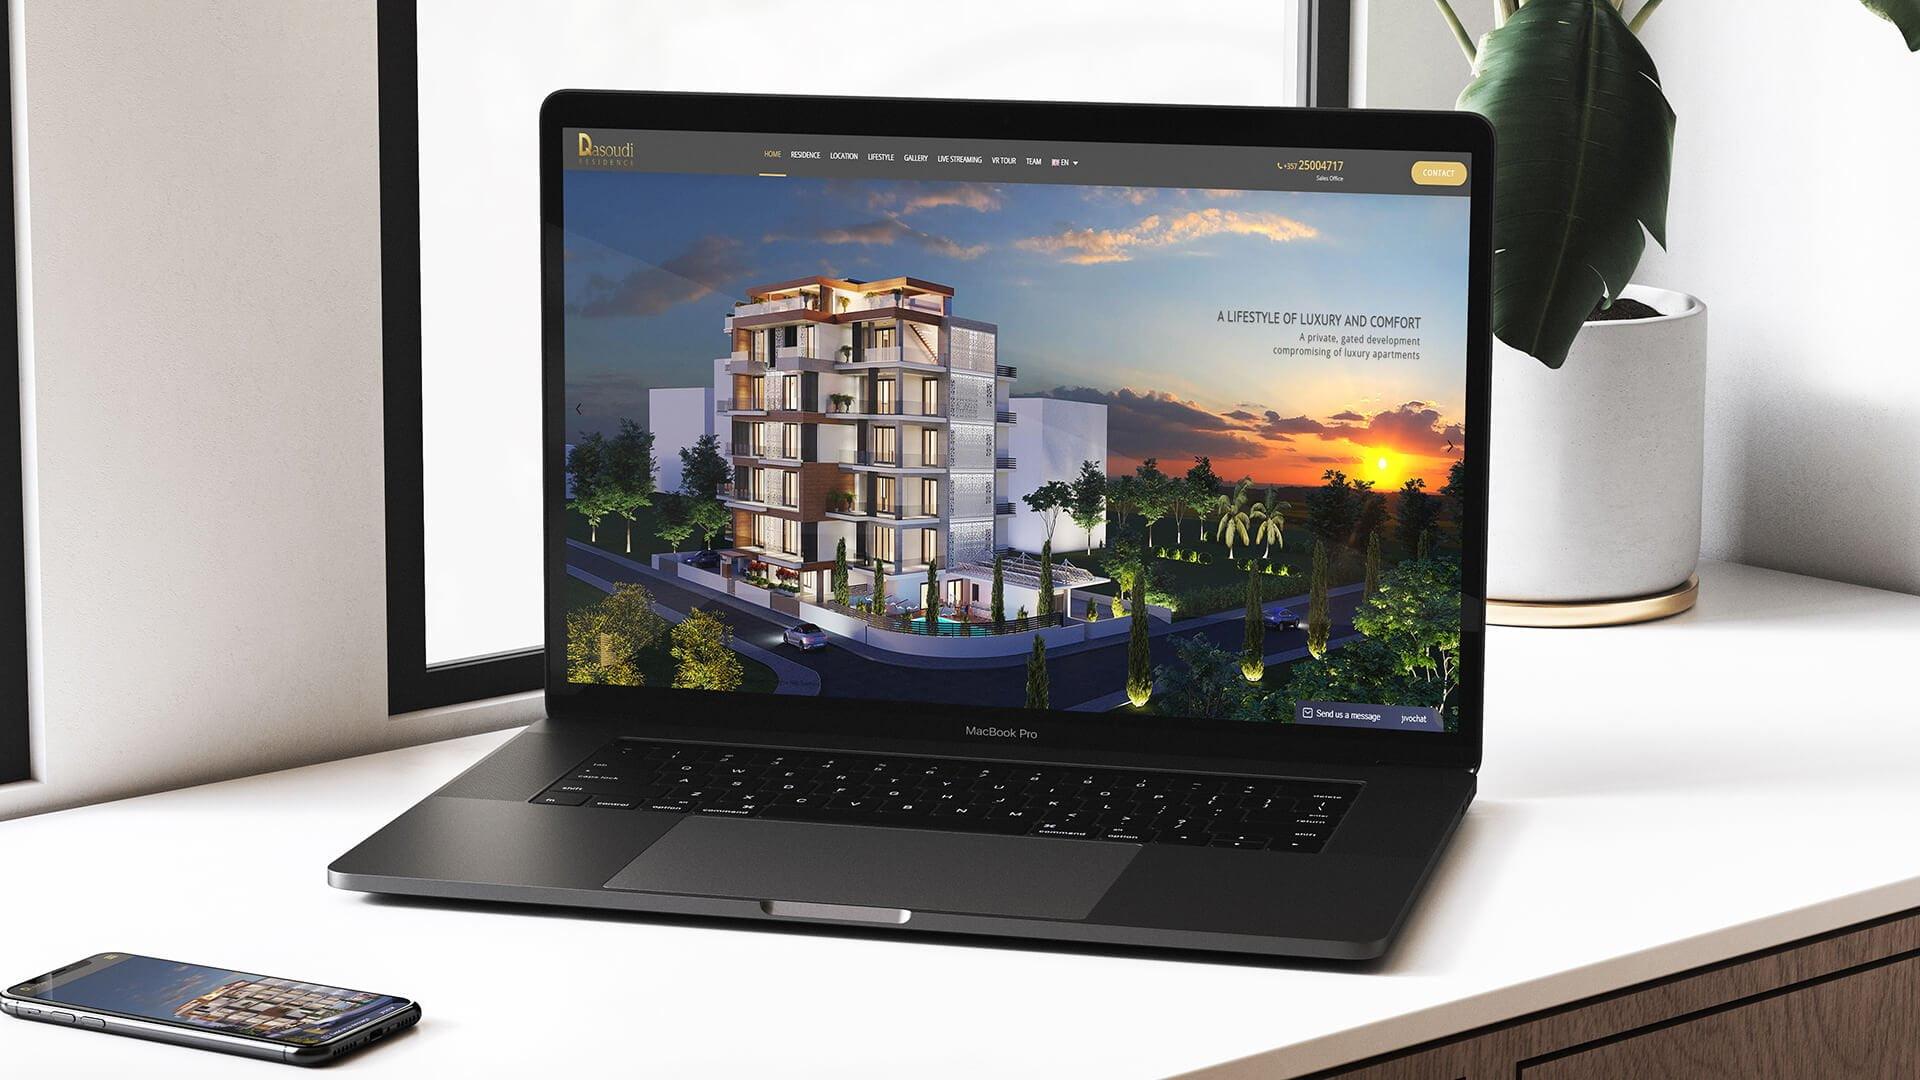 Dasoudi Residence Website